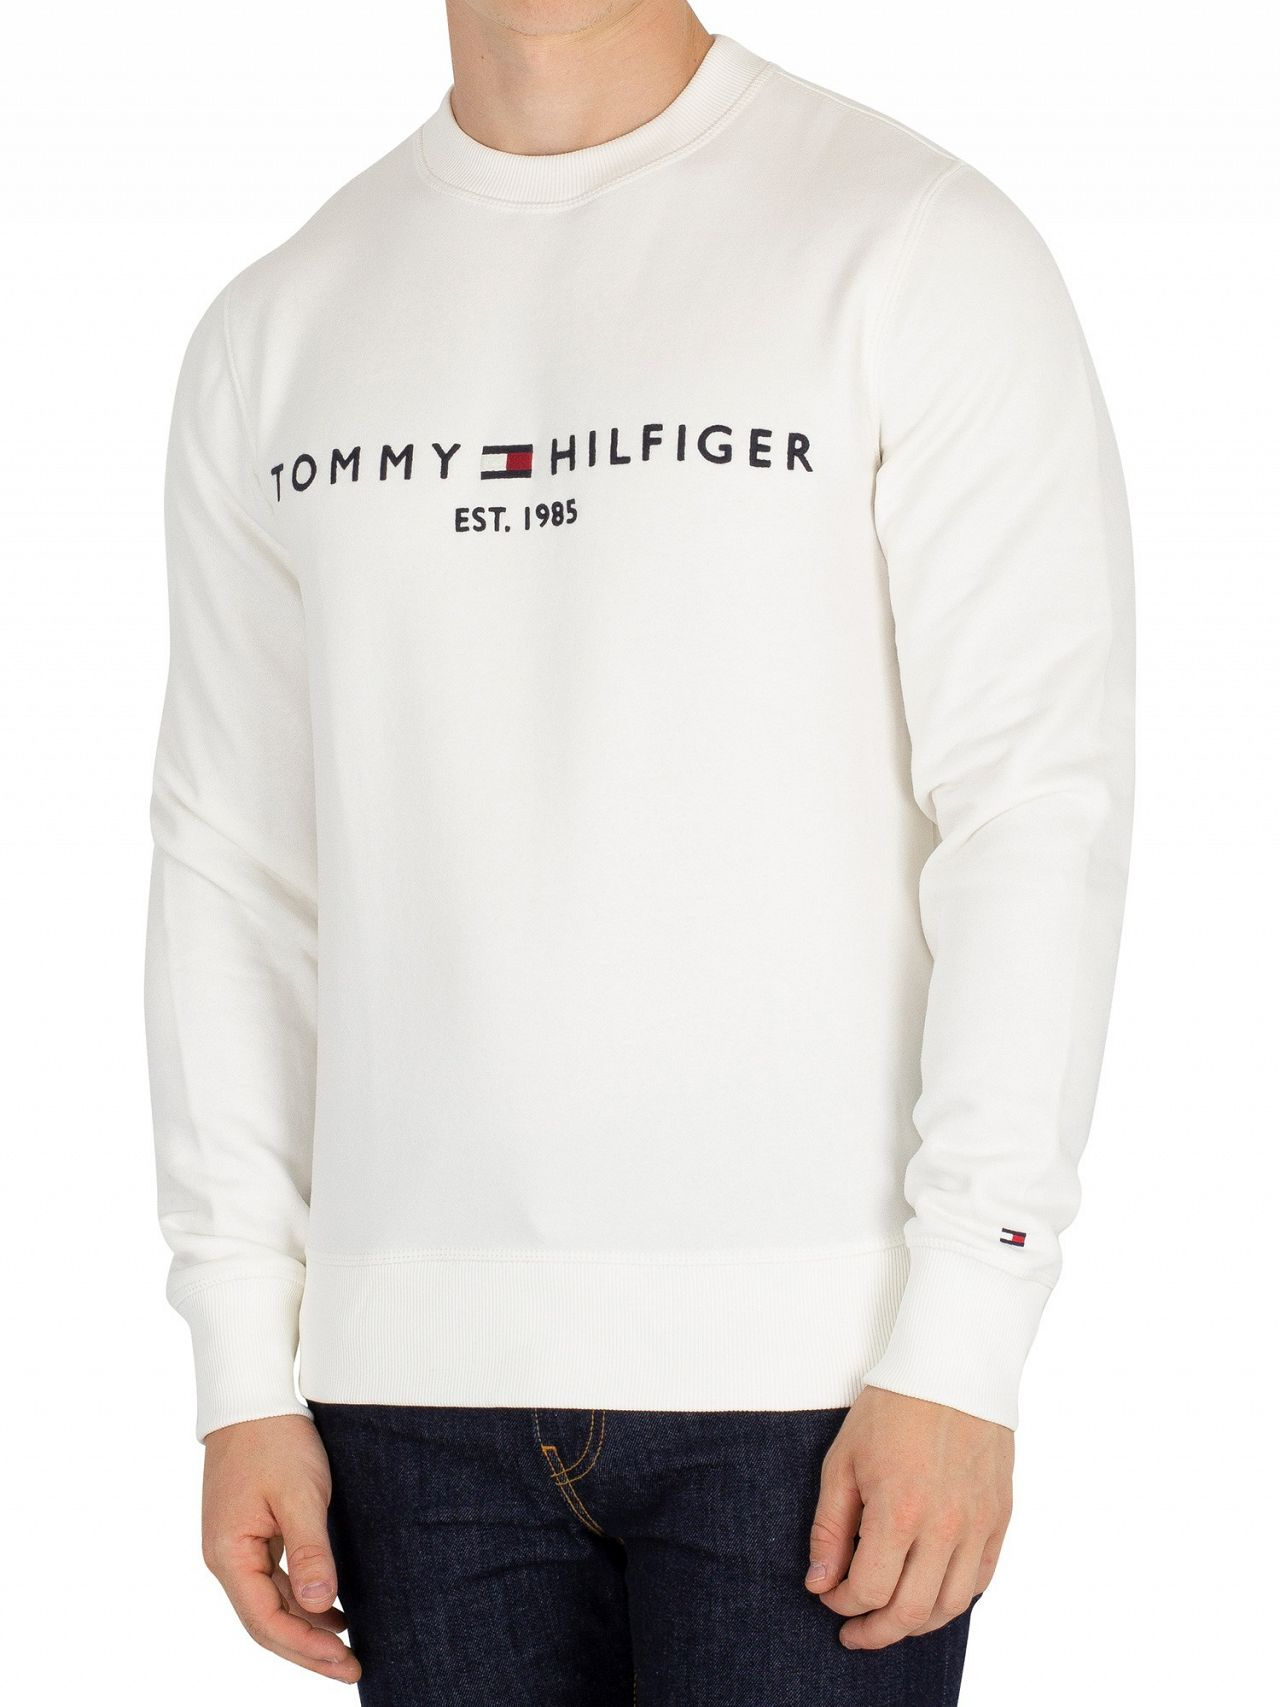 34ae2dcf8f82ce Tommy Hilfiger Snow White Graphic Sweatshirt